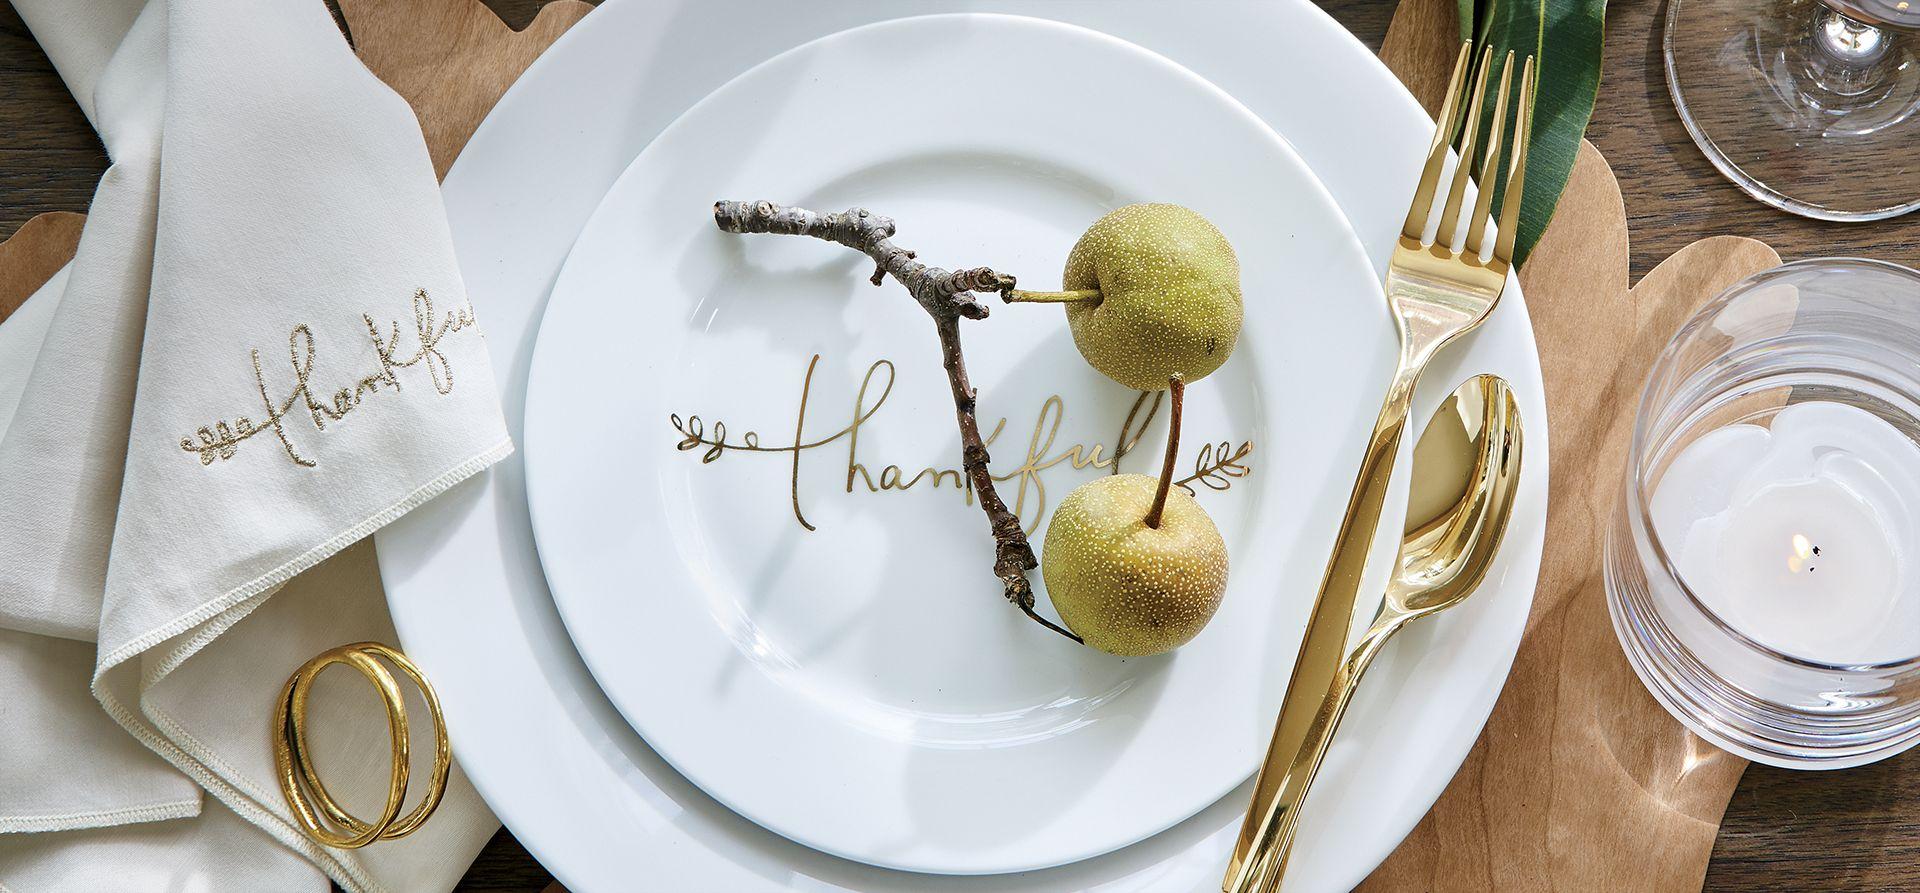 Thanksgiving Dinnerware u0026 Decorations : Crate and Barrel